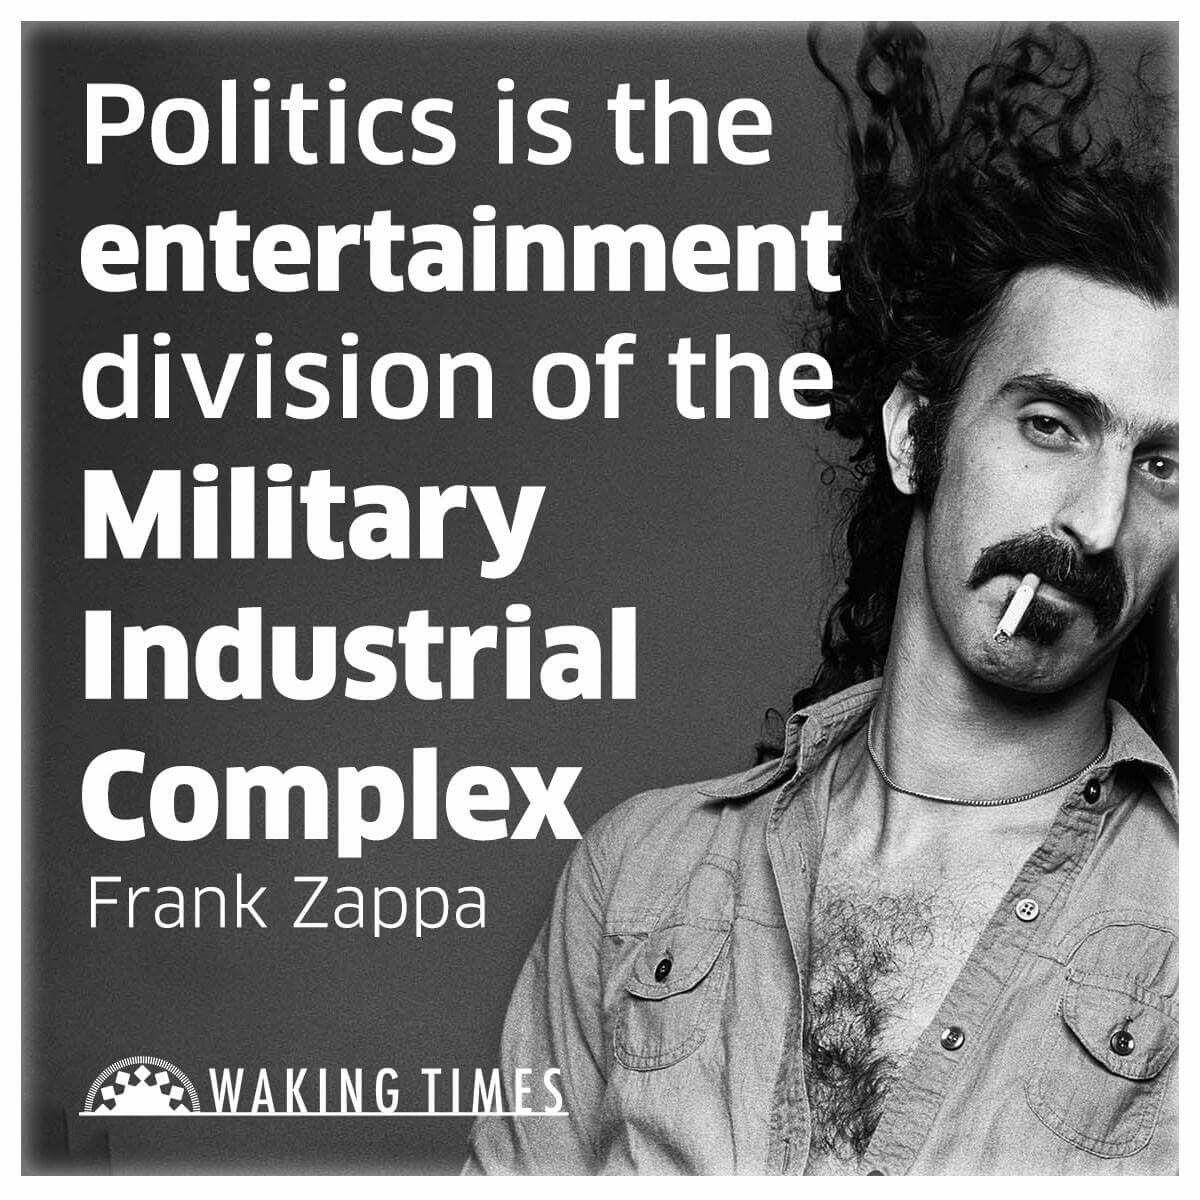 Politics serves as distraction Politics, Anarchism, Self